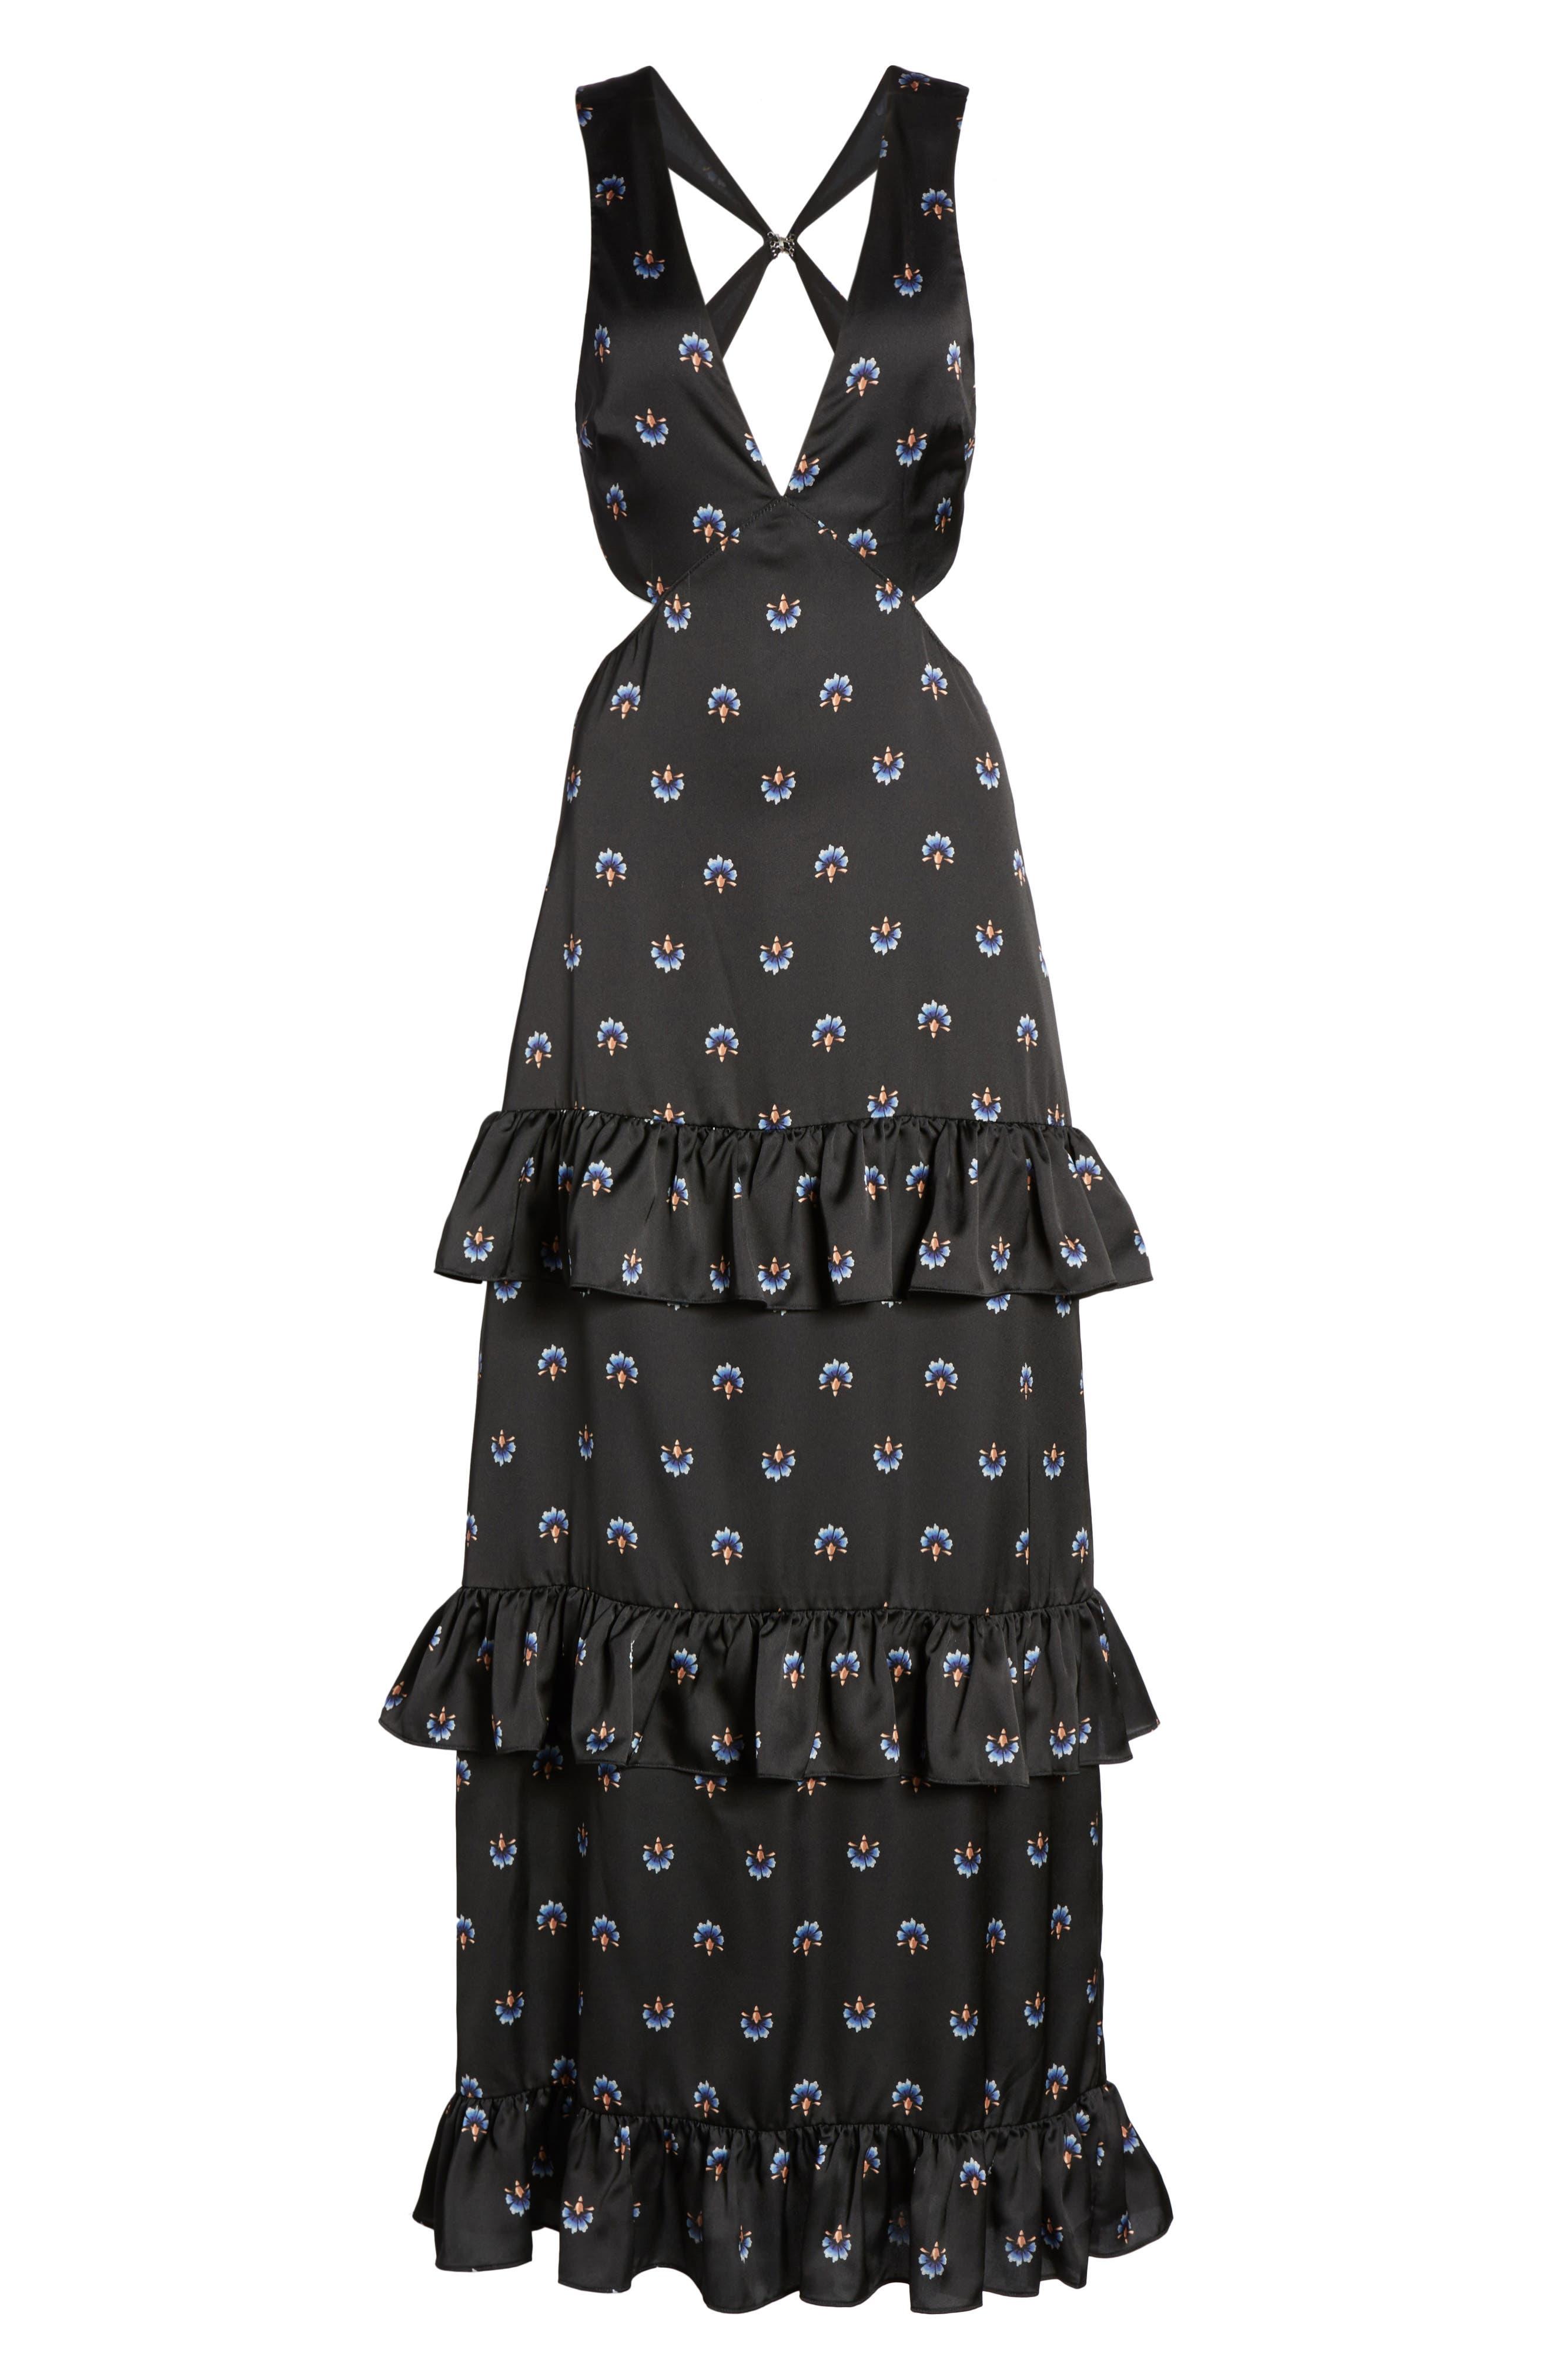 Lanna Tiered Maxi Dress,                             Alternate thumbnail 6, color,                             003